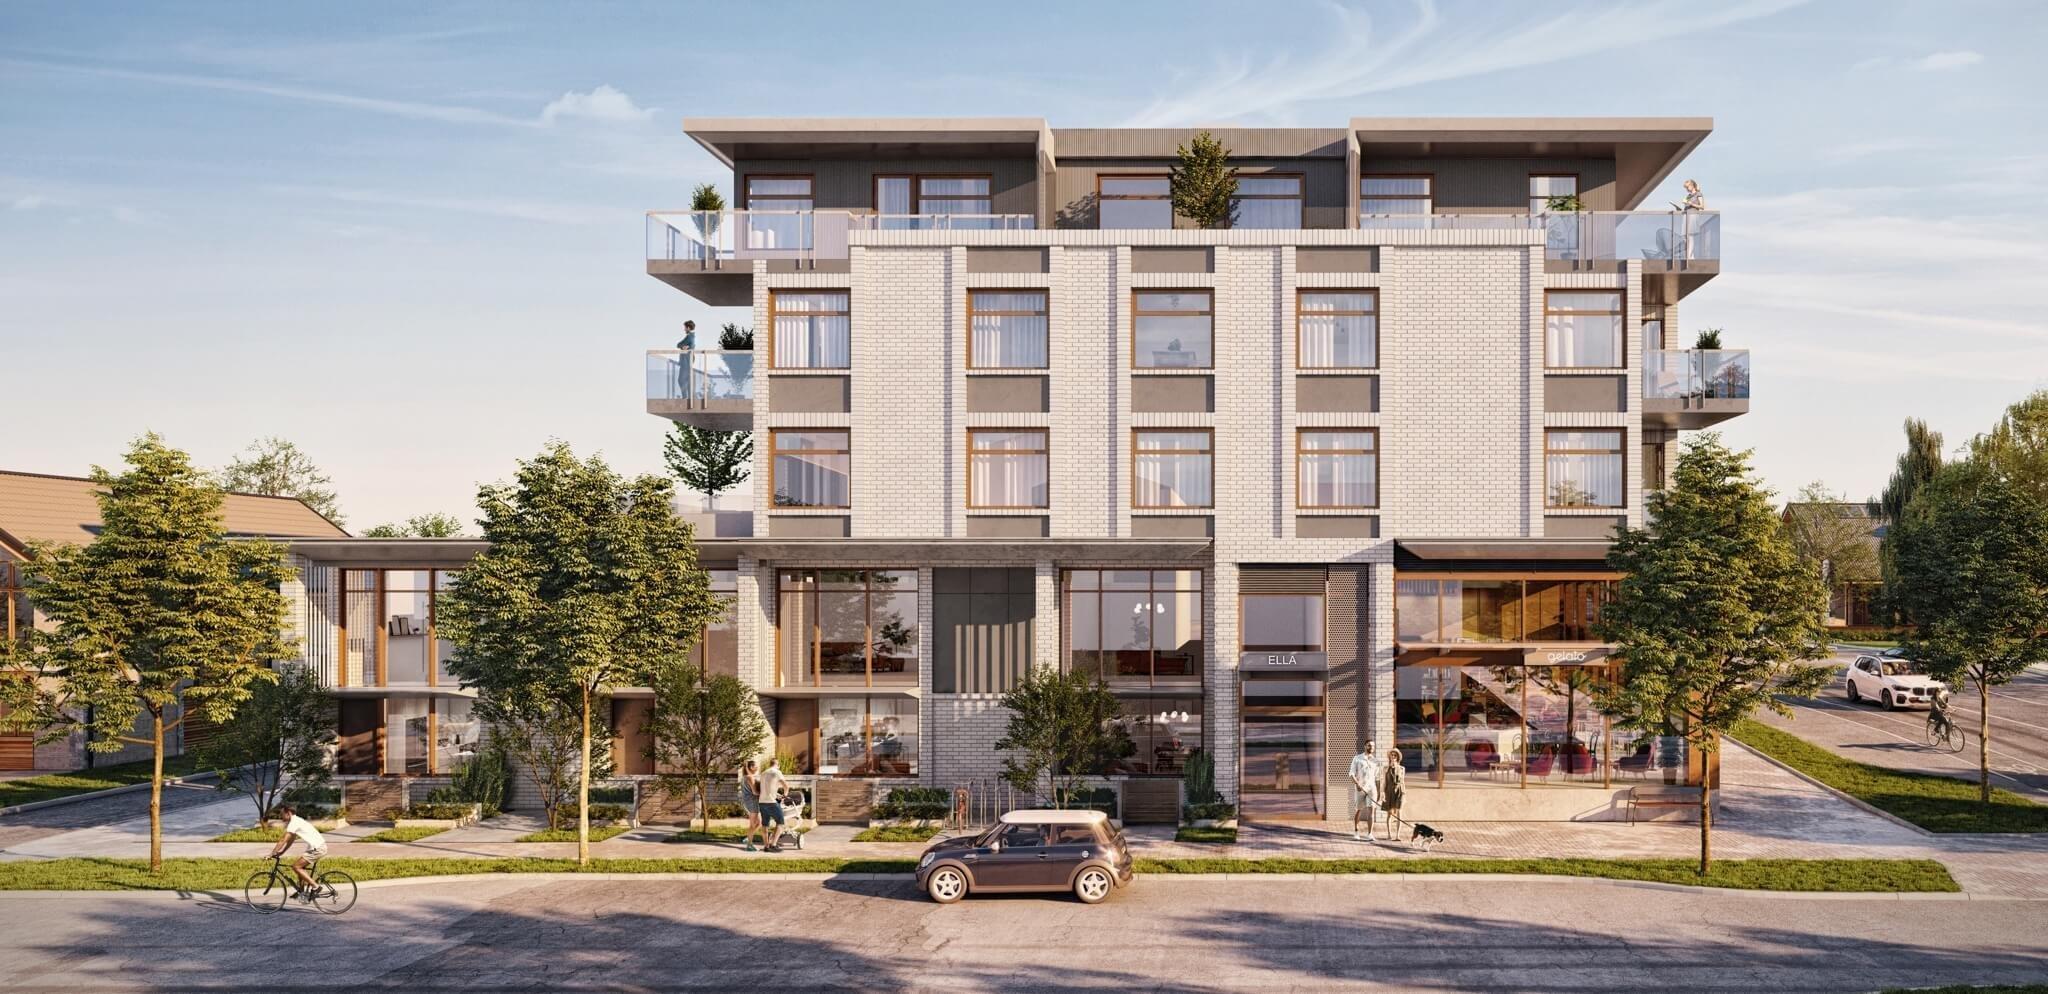 Building Exterior - 2408 Grant St, Vancouver, BC V0V 0V0, Canada!